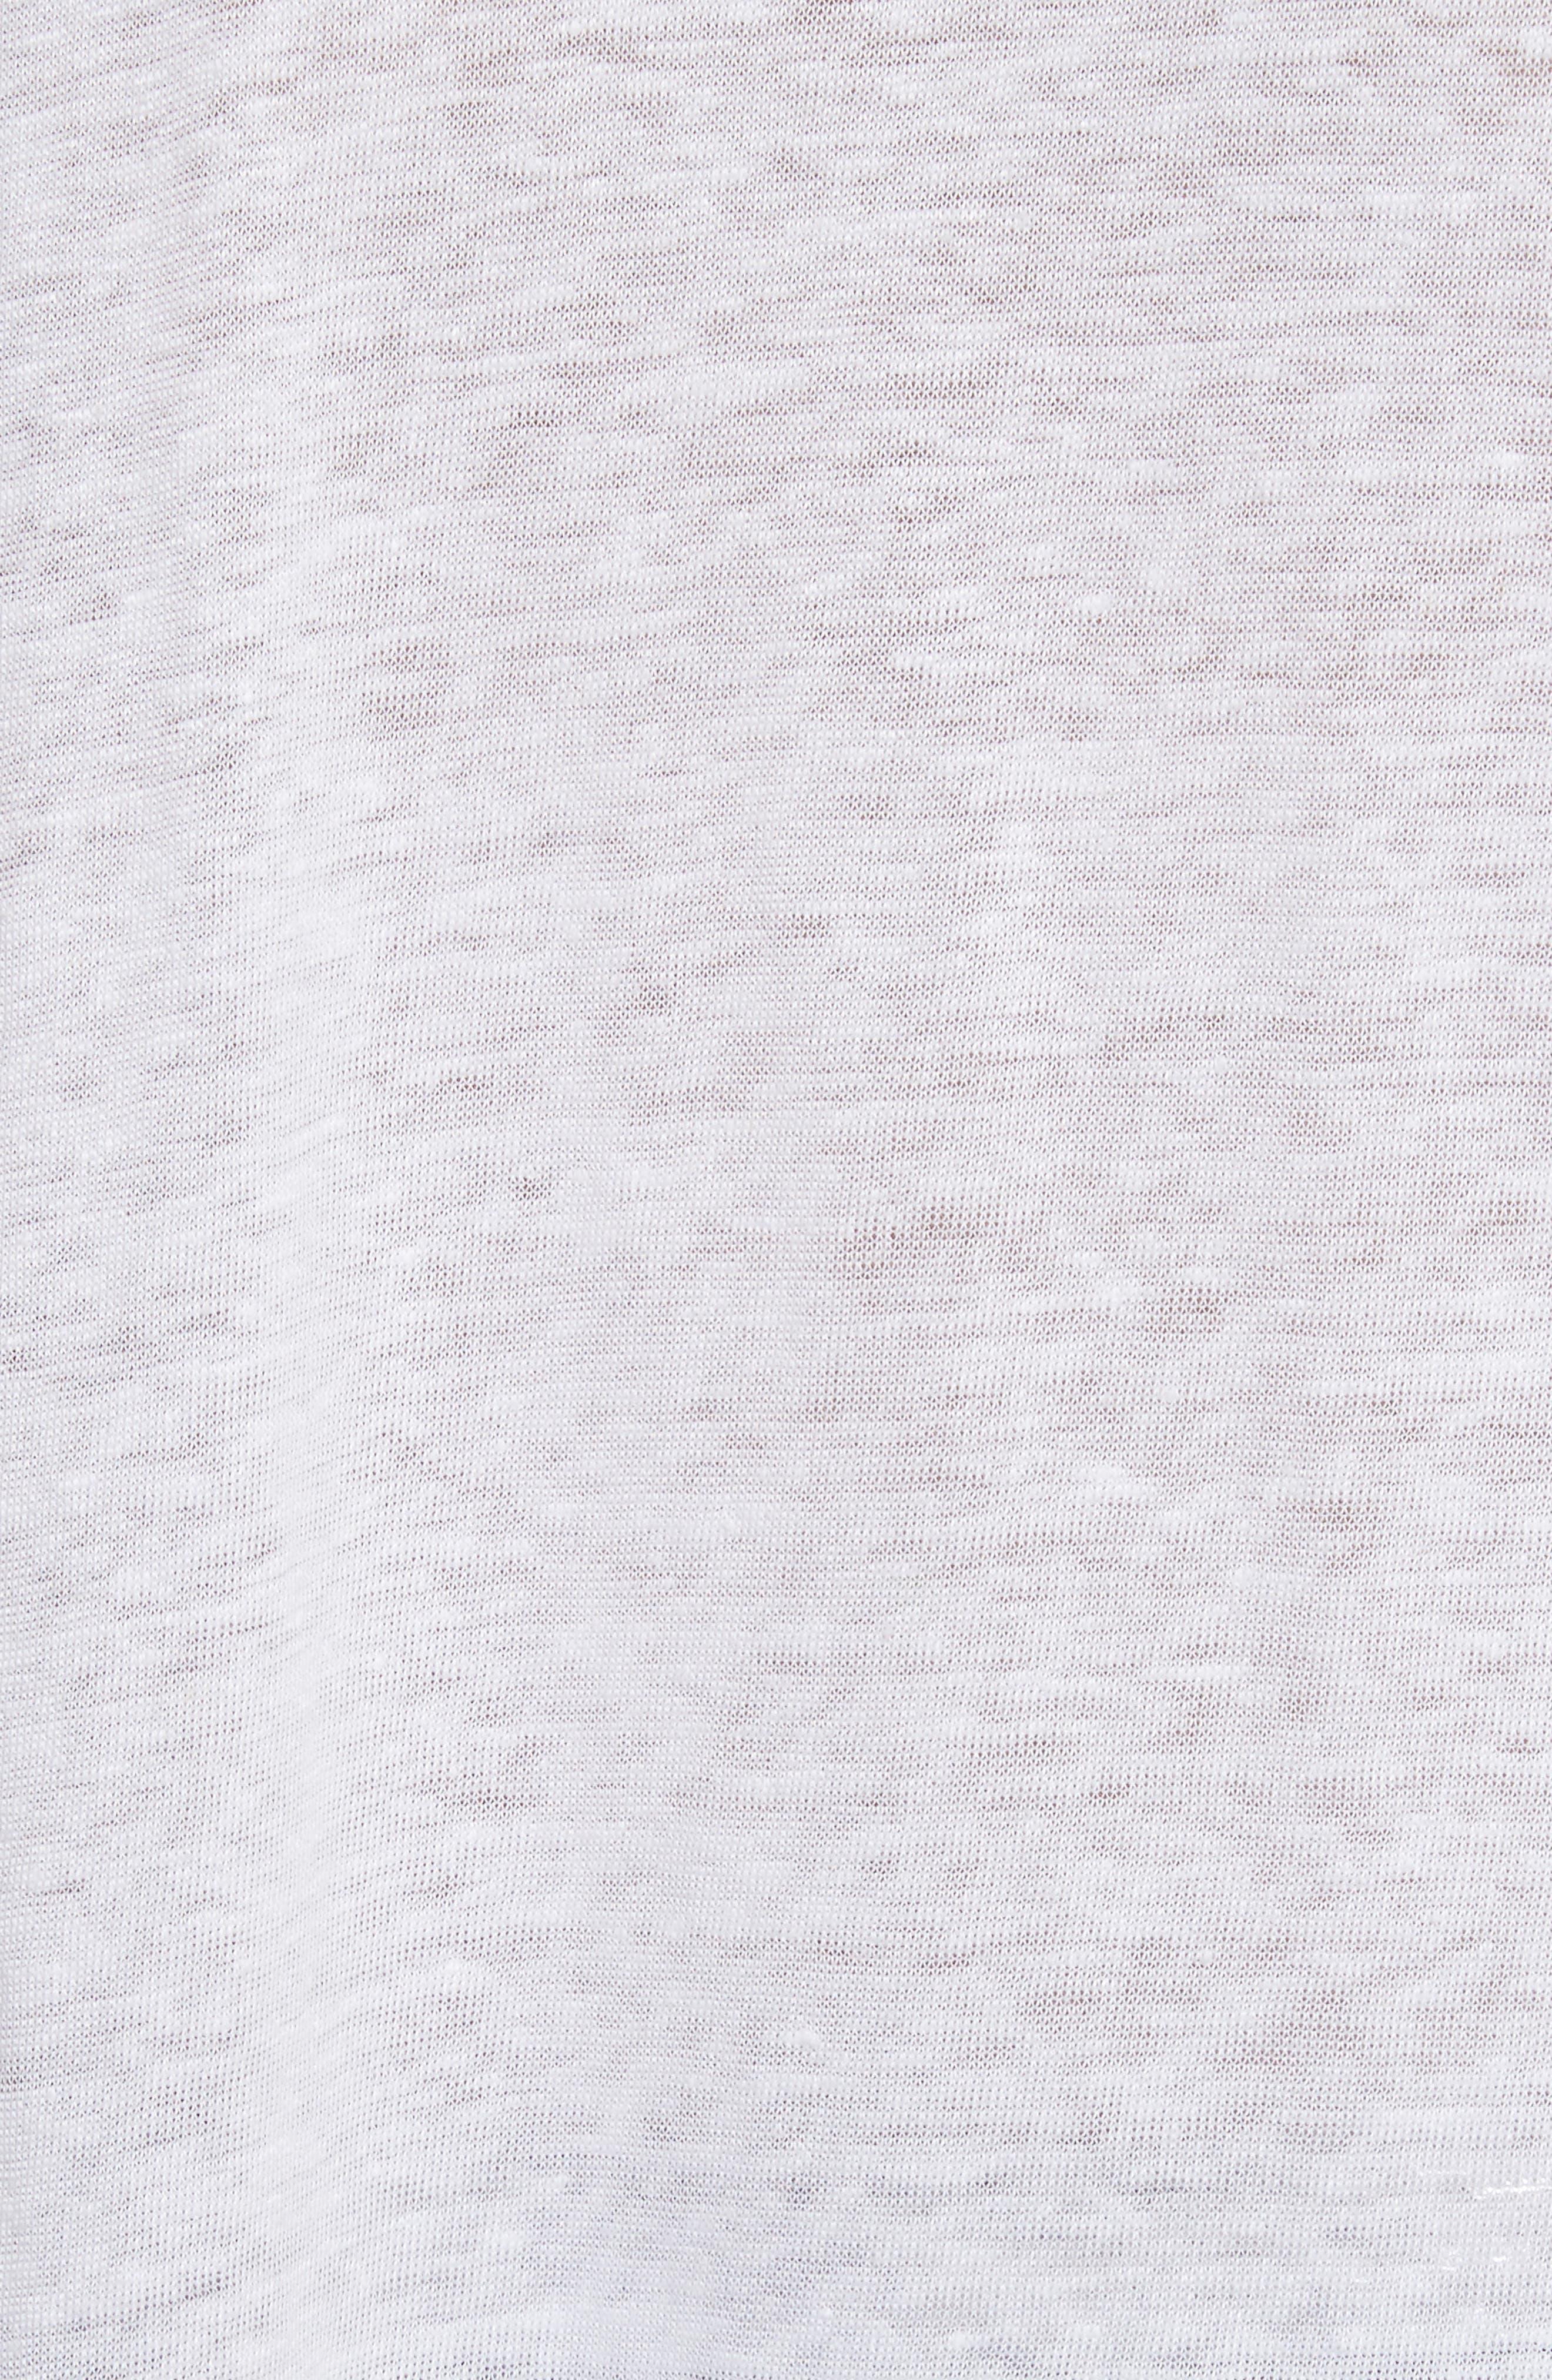 Karami Linen Asymmetrical Lace-Up Top,                             Alternate thumbnail 5, color,                             White